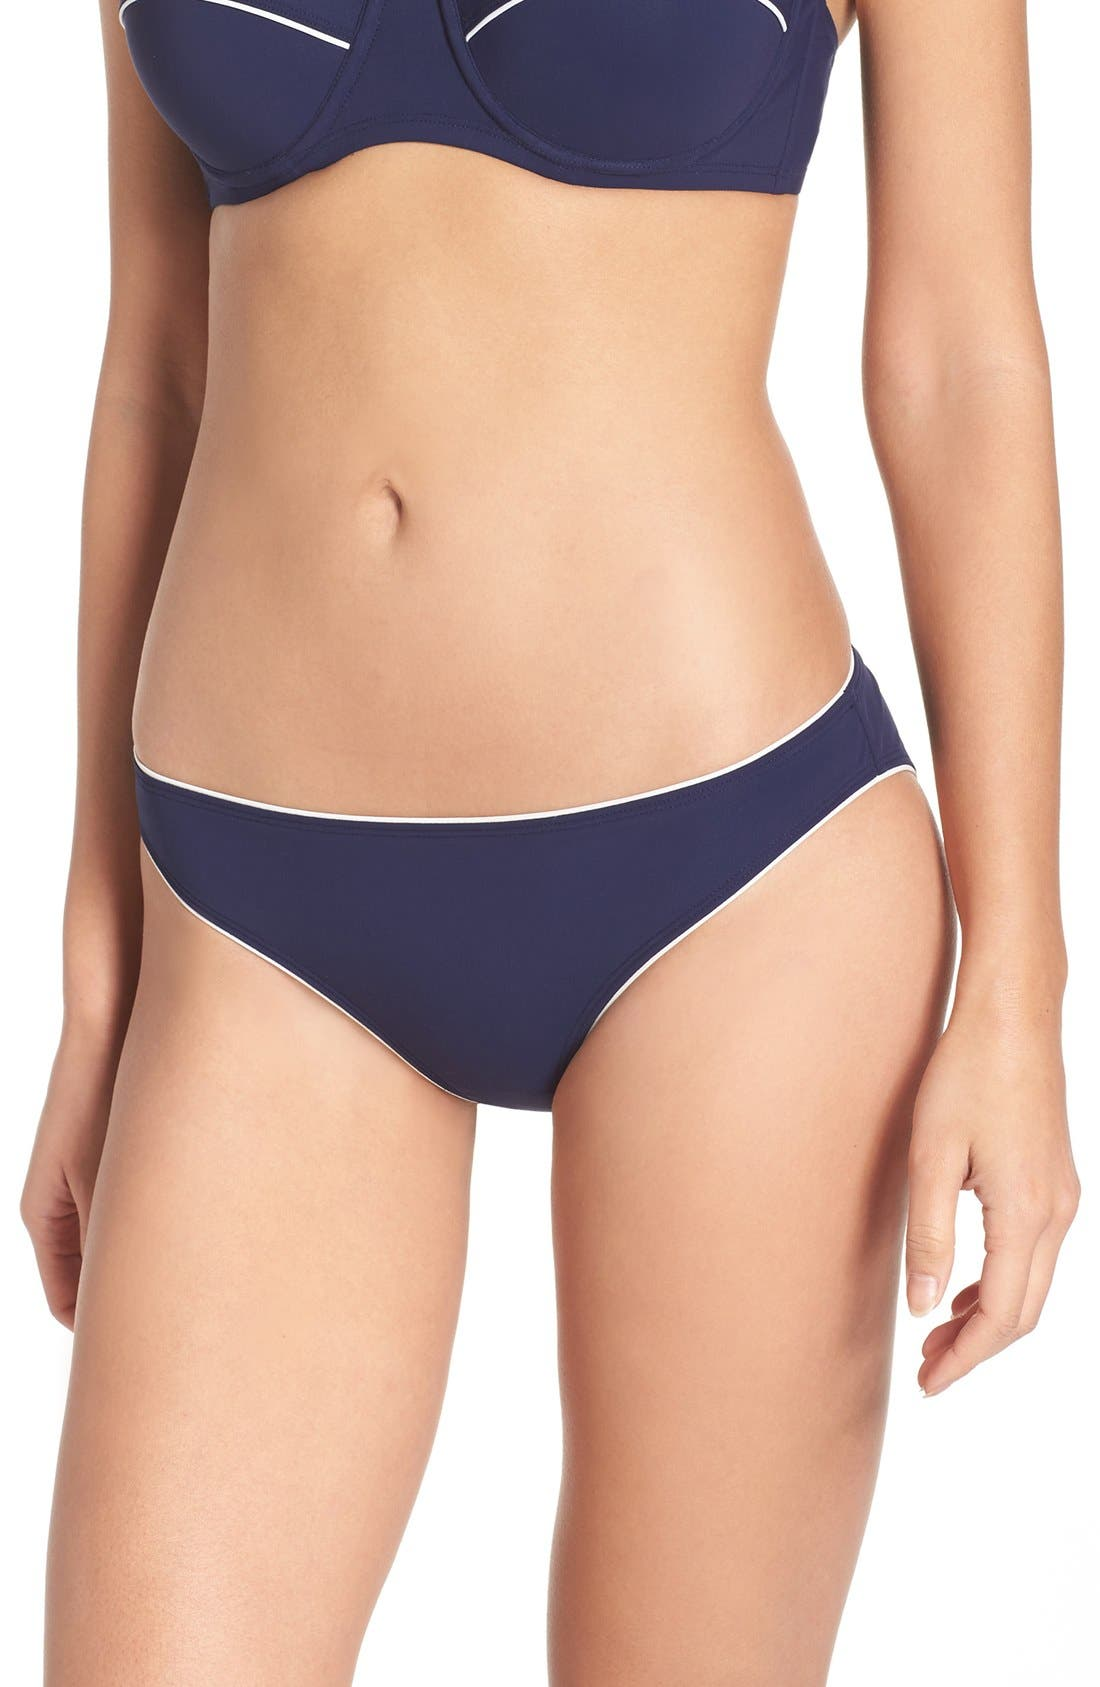 TORY BURCH Riviera Hipster Bikini Bottoms